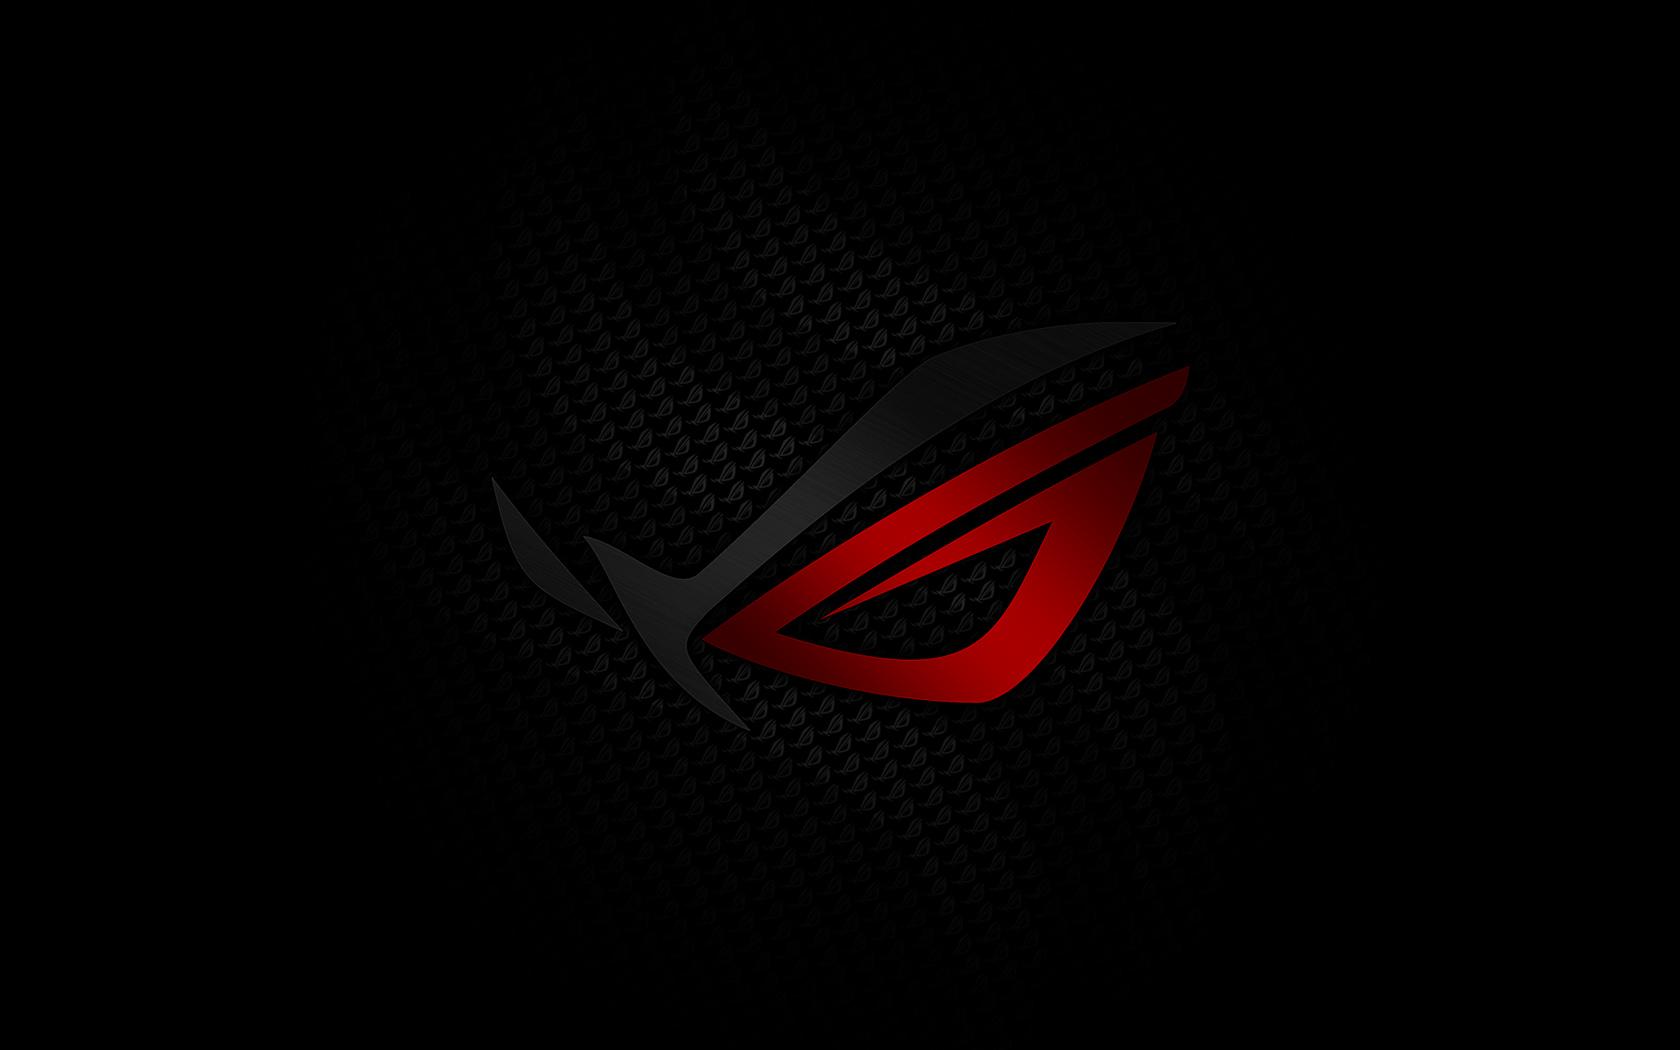 Asus Republic Of Gamers Wallpaper Pack V2 By Blackout1911 On Deviantart